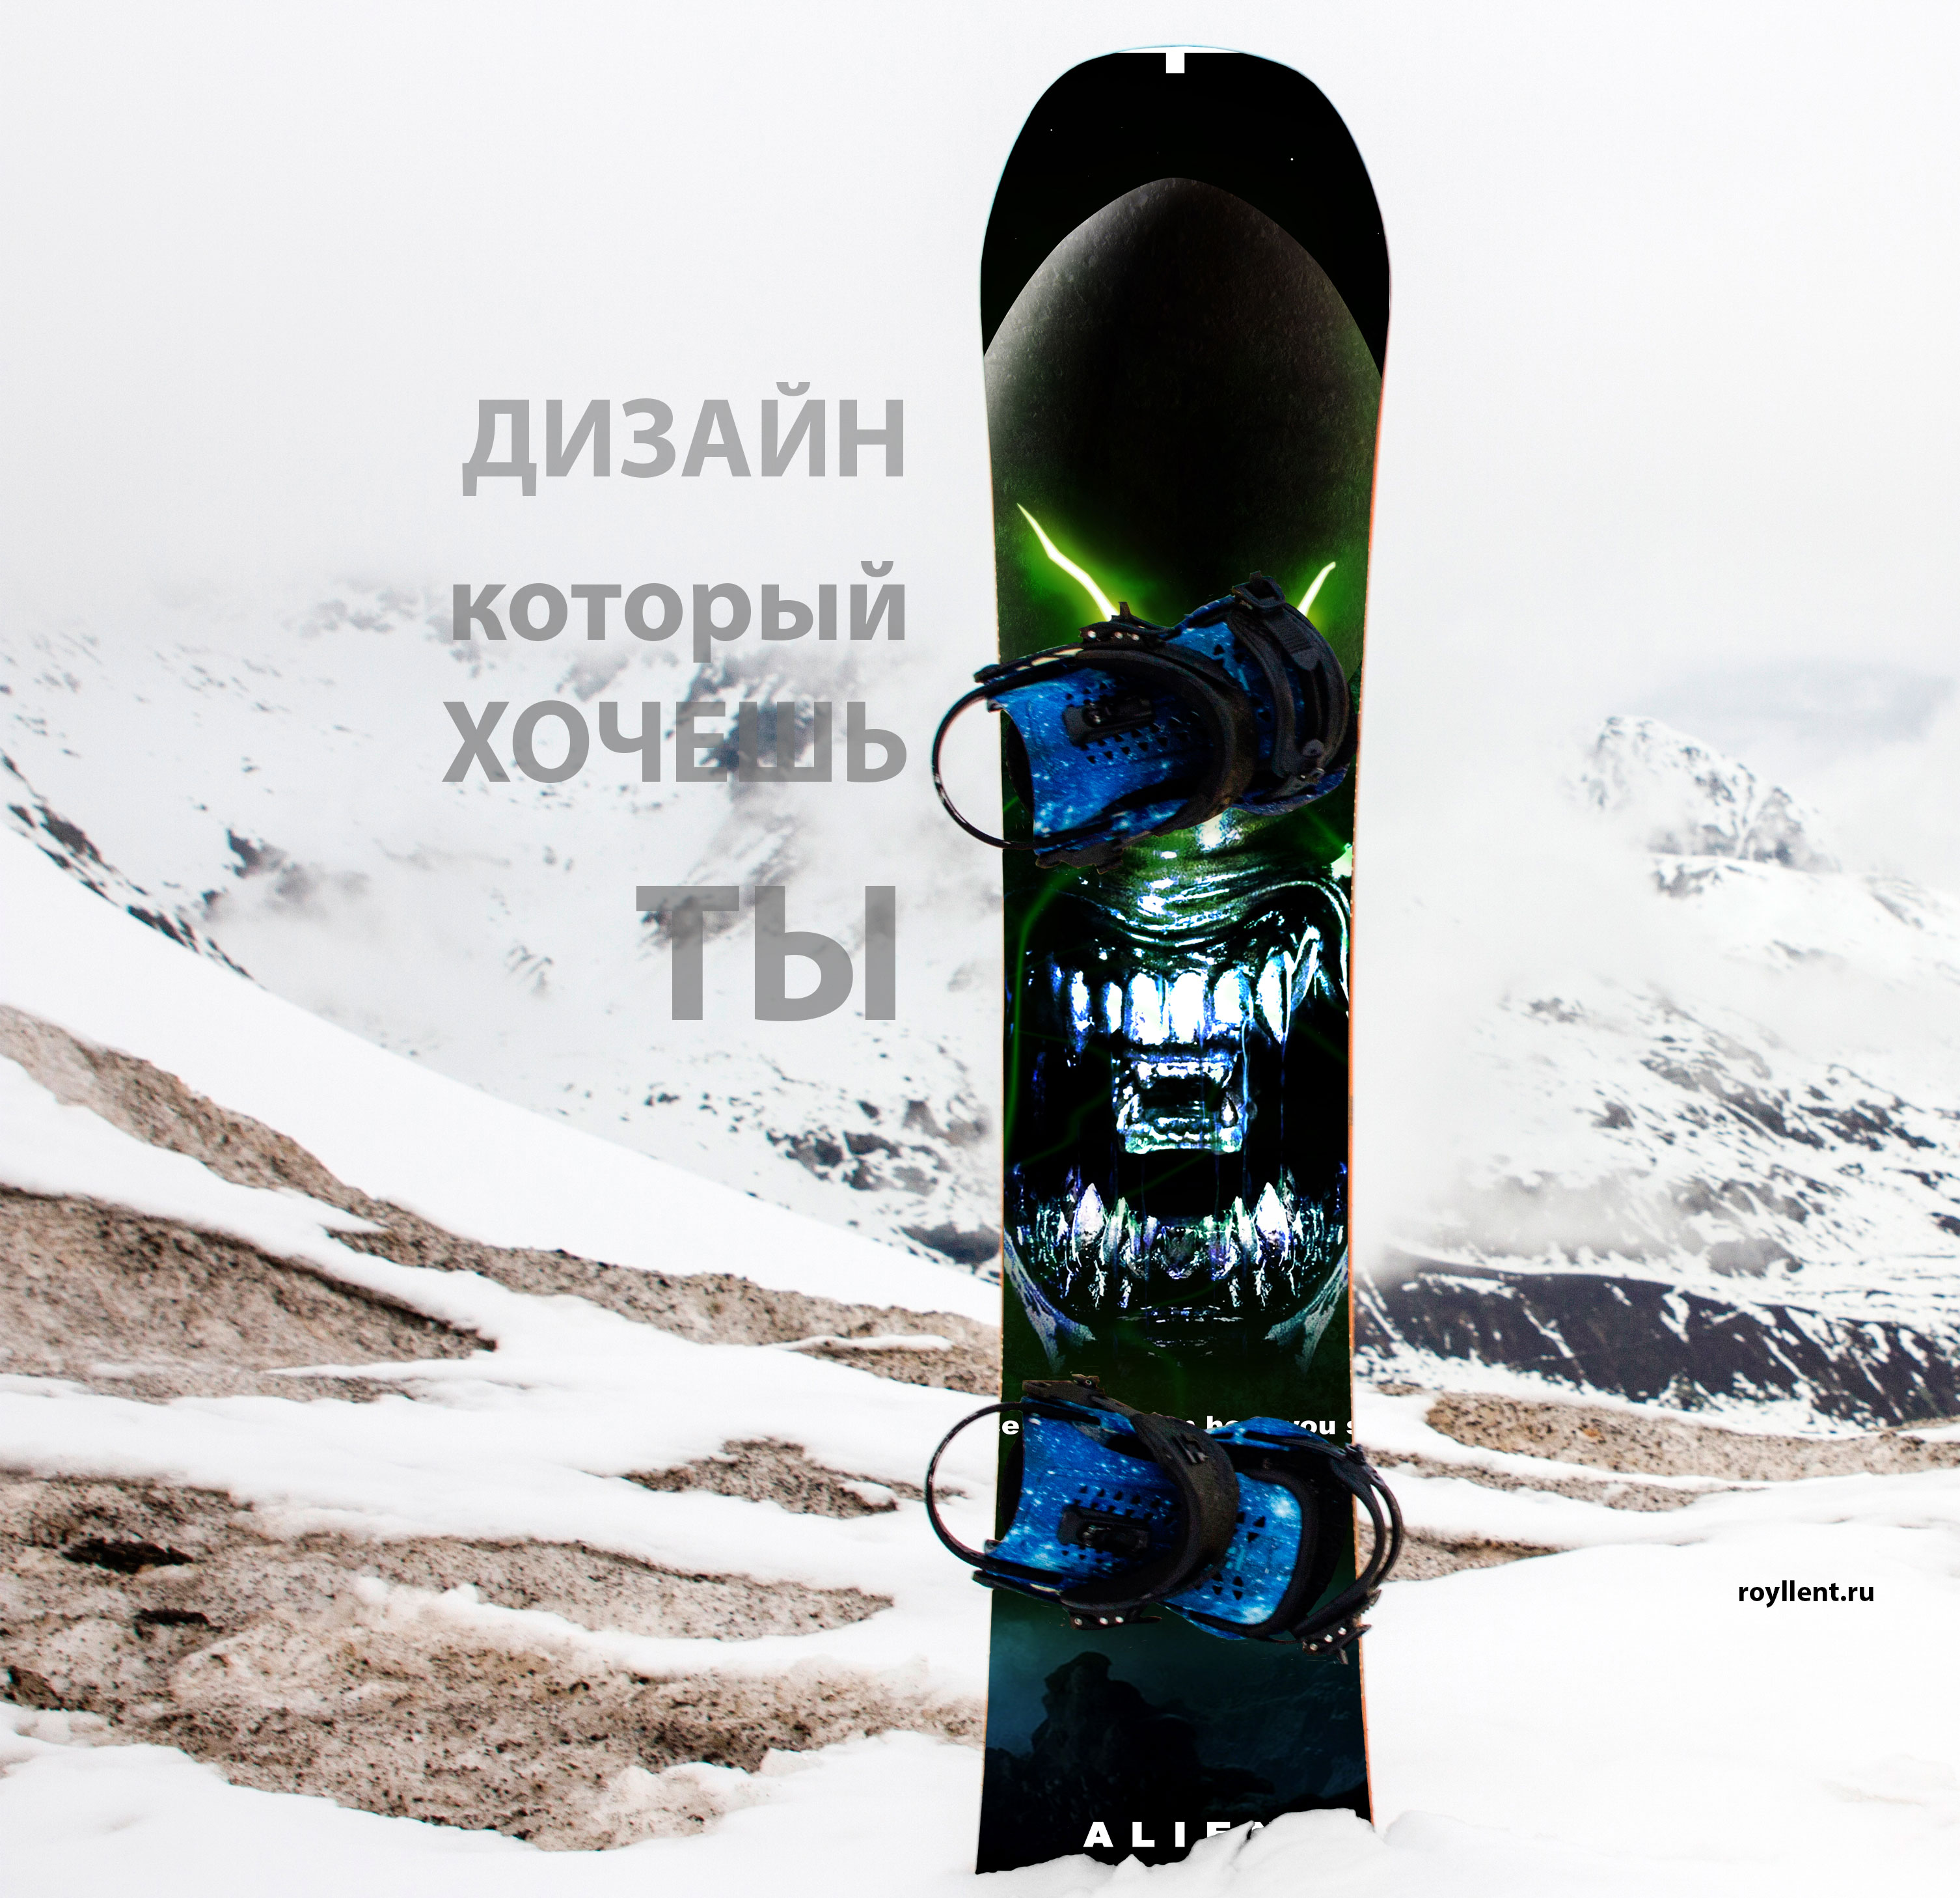 Дизайн сноуборда в стиле Чужих